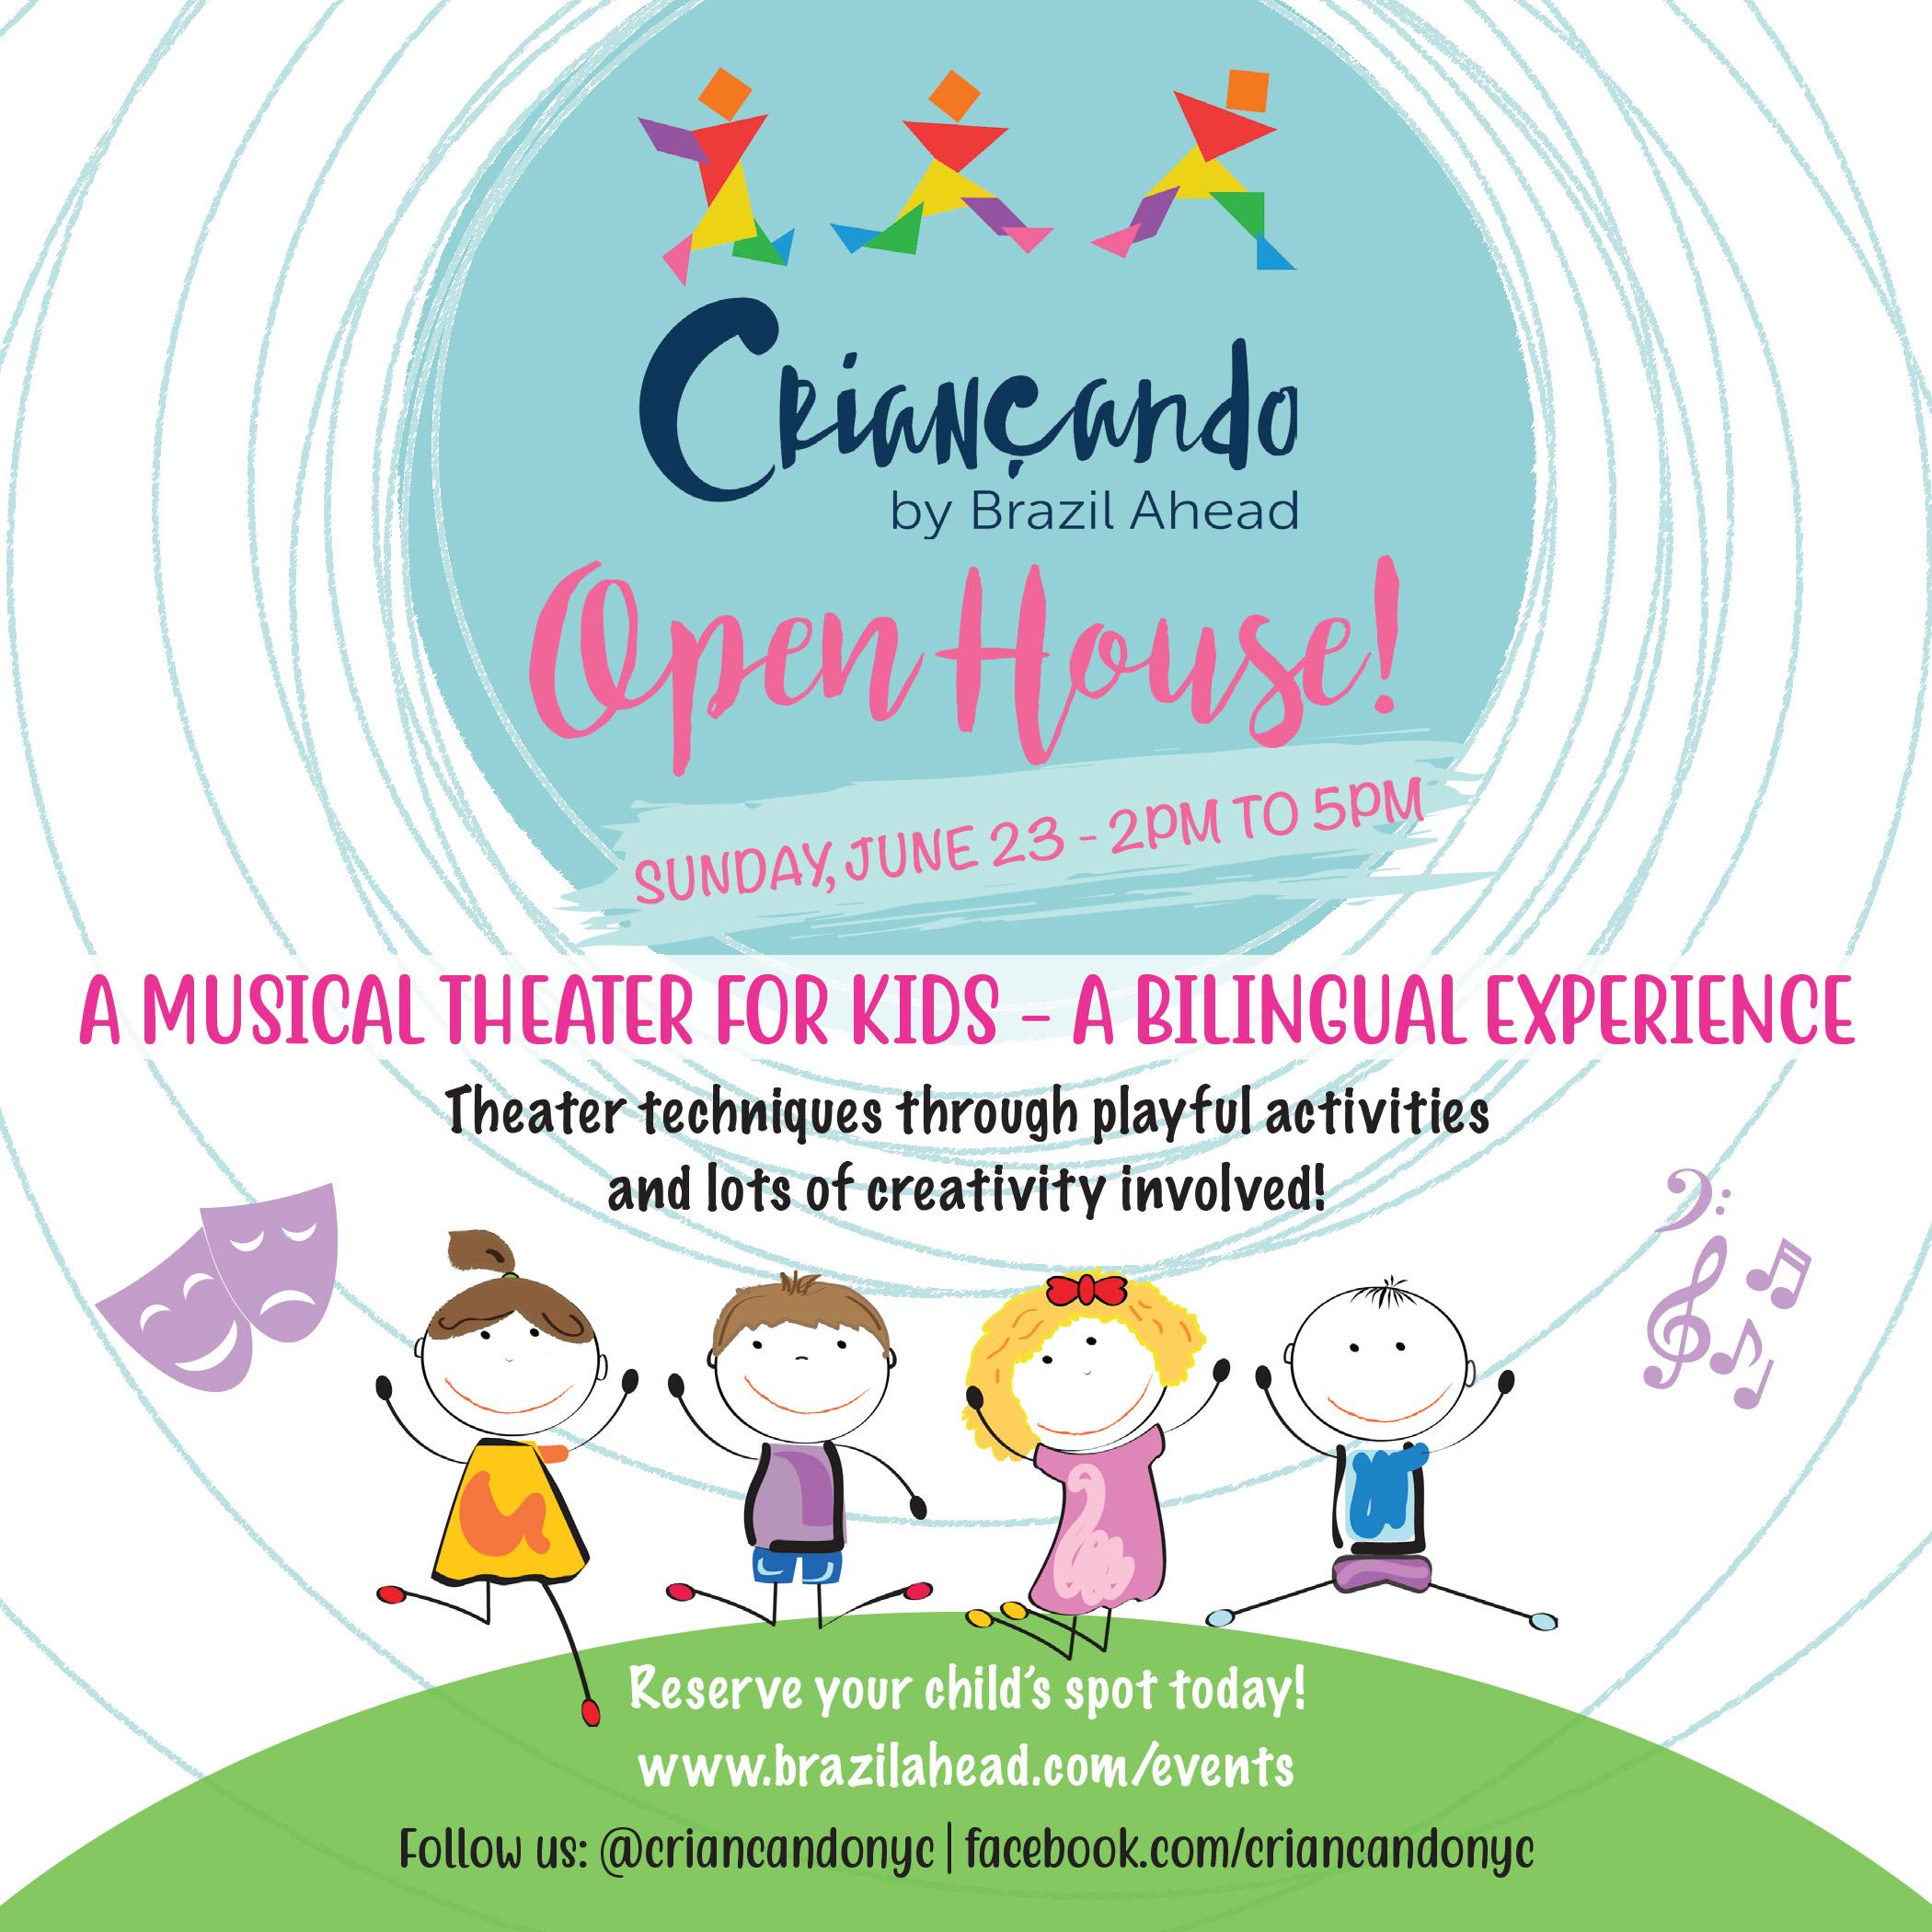 Criancando_OpenHouse